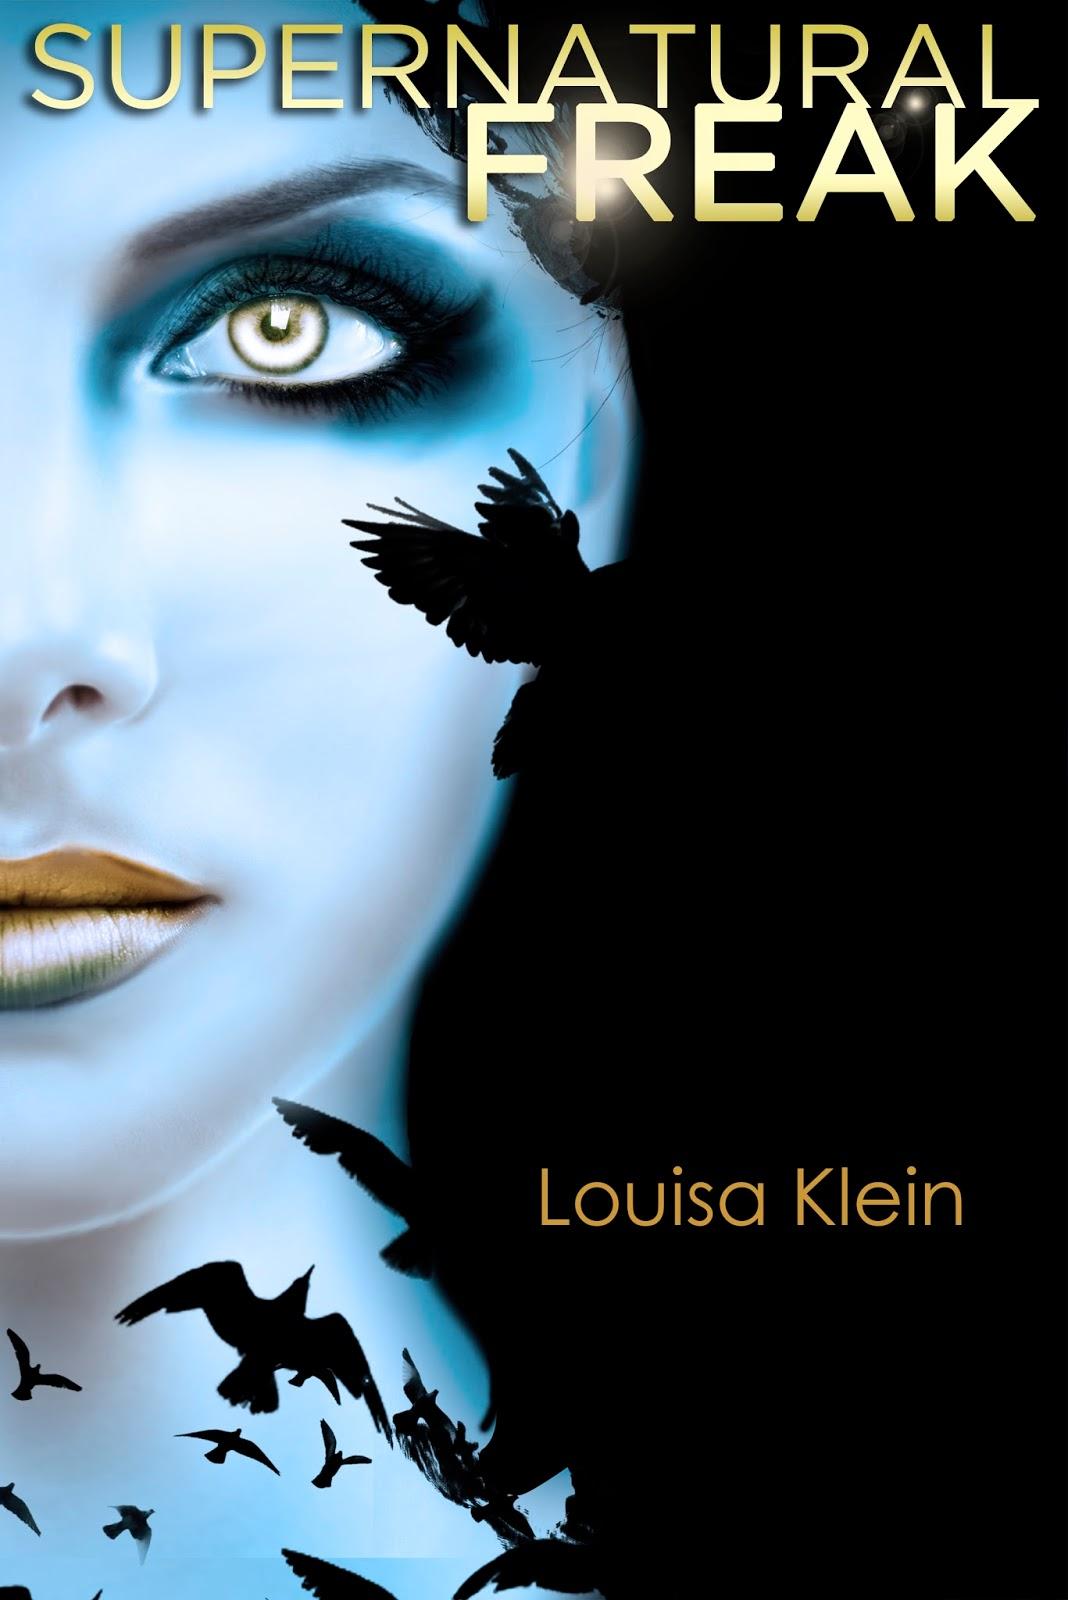 Supernatural Freak by Louisa Klein Genre: Urban Fantasy/Paranormal Release  Date: January 30th 2013